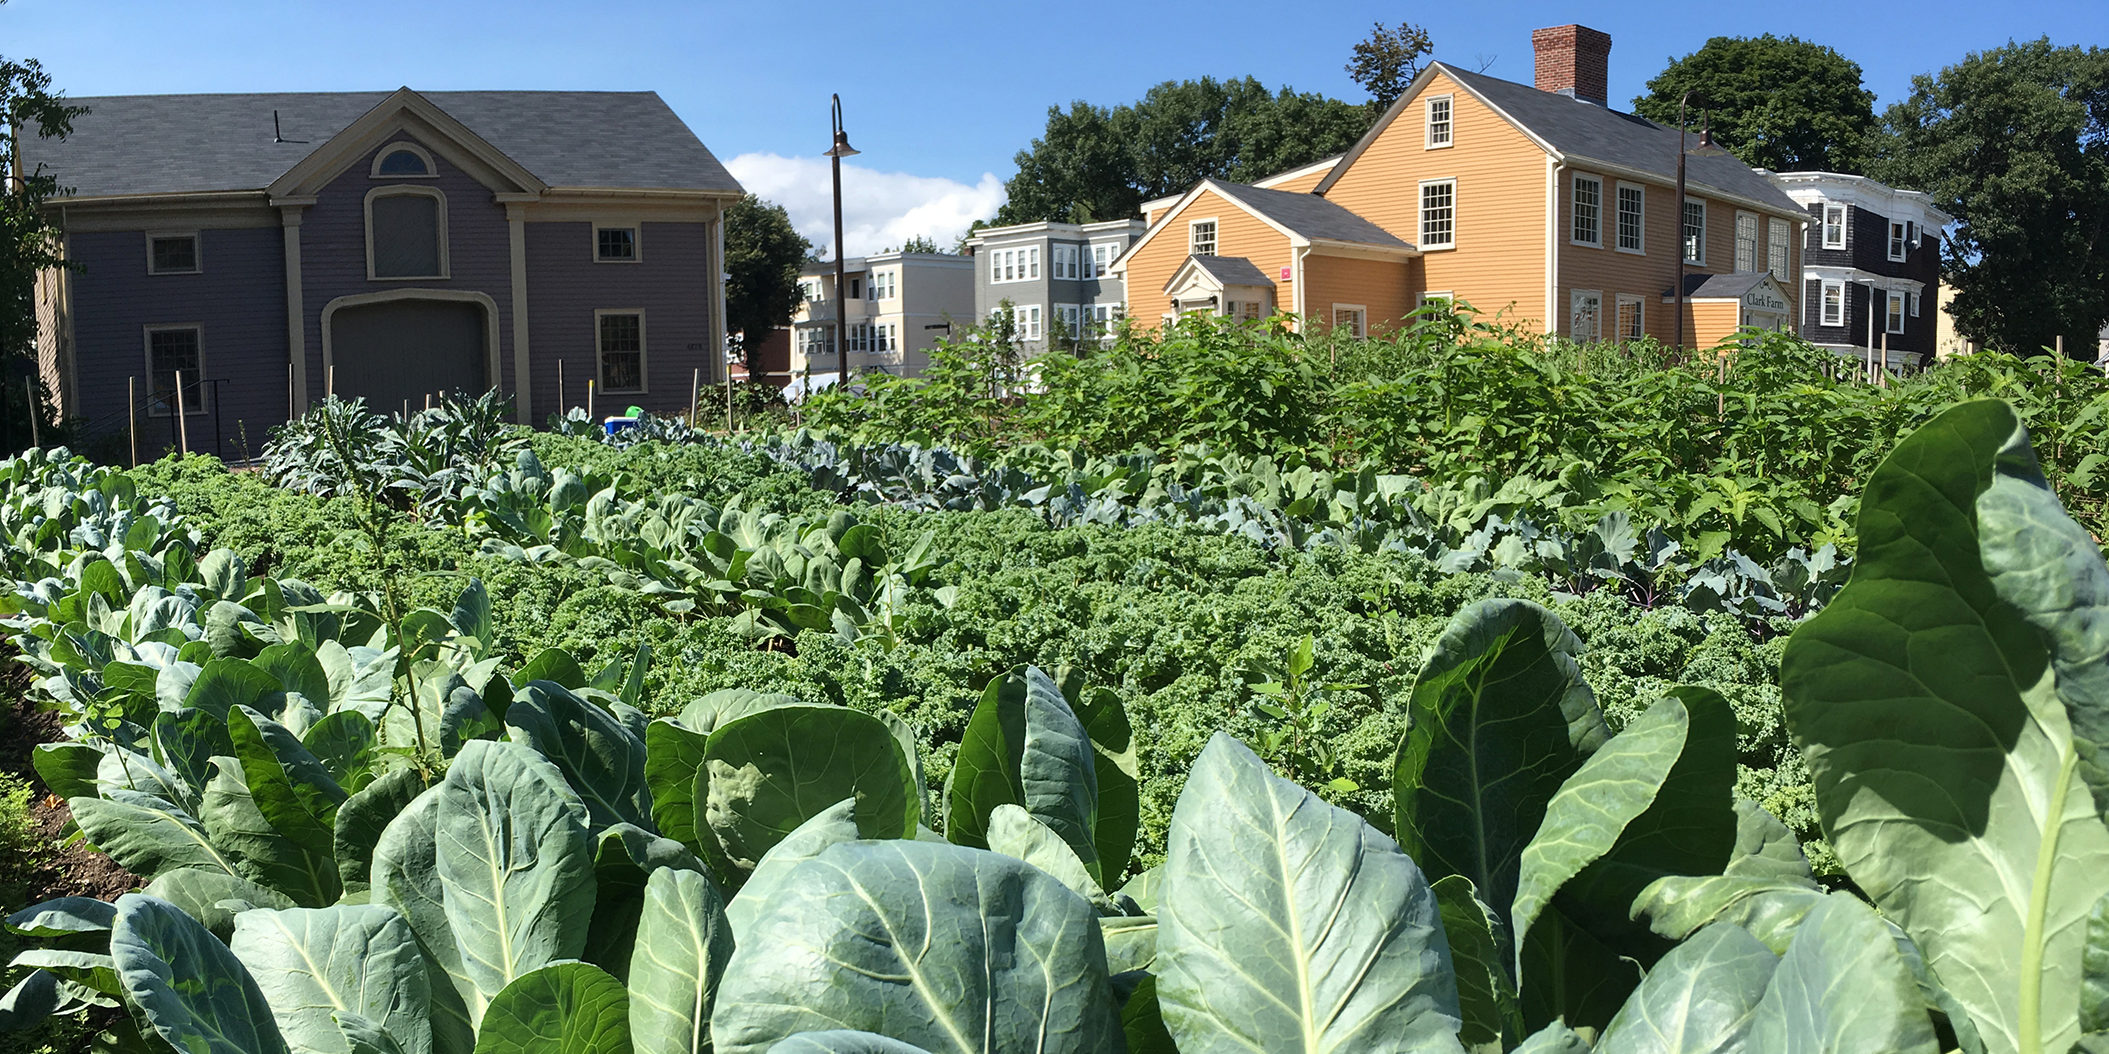 lush brassicas at fowler clark epstein urban farm